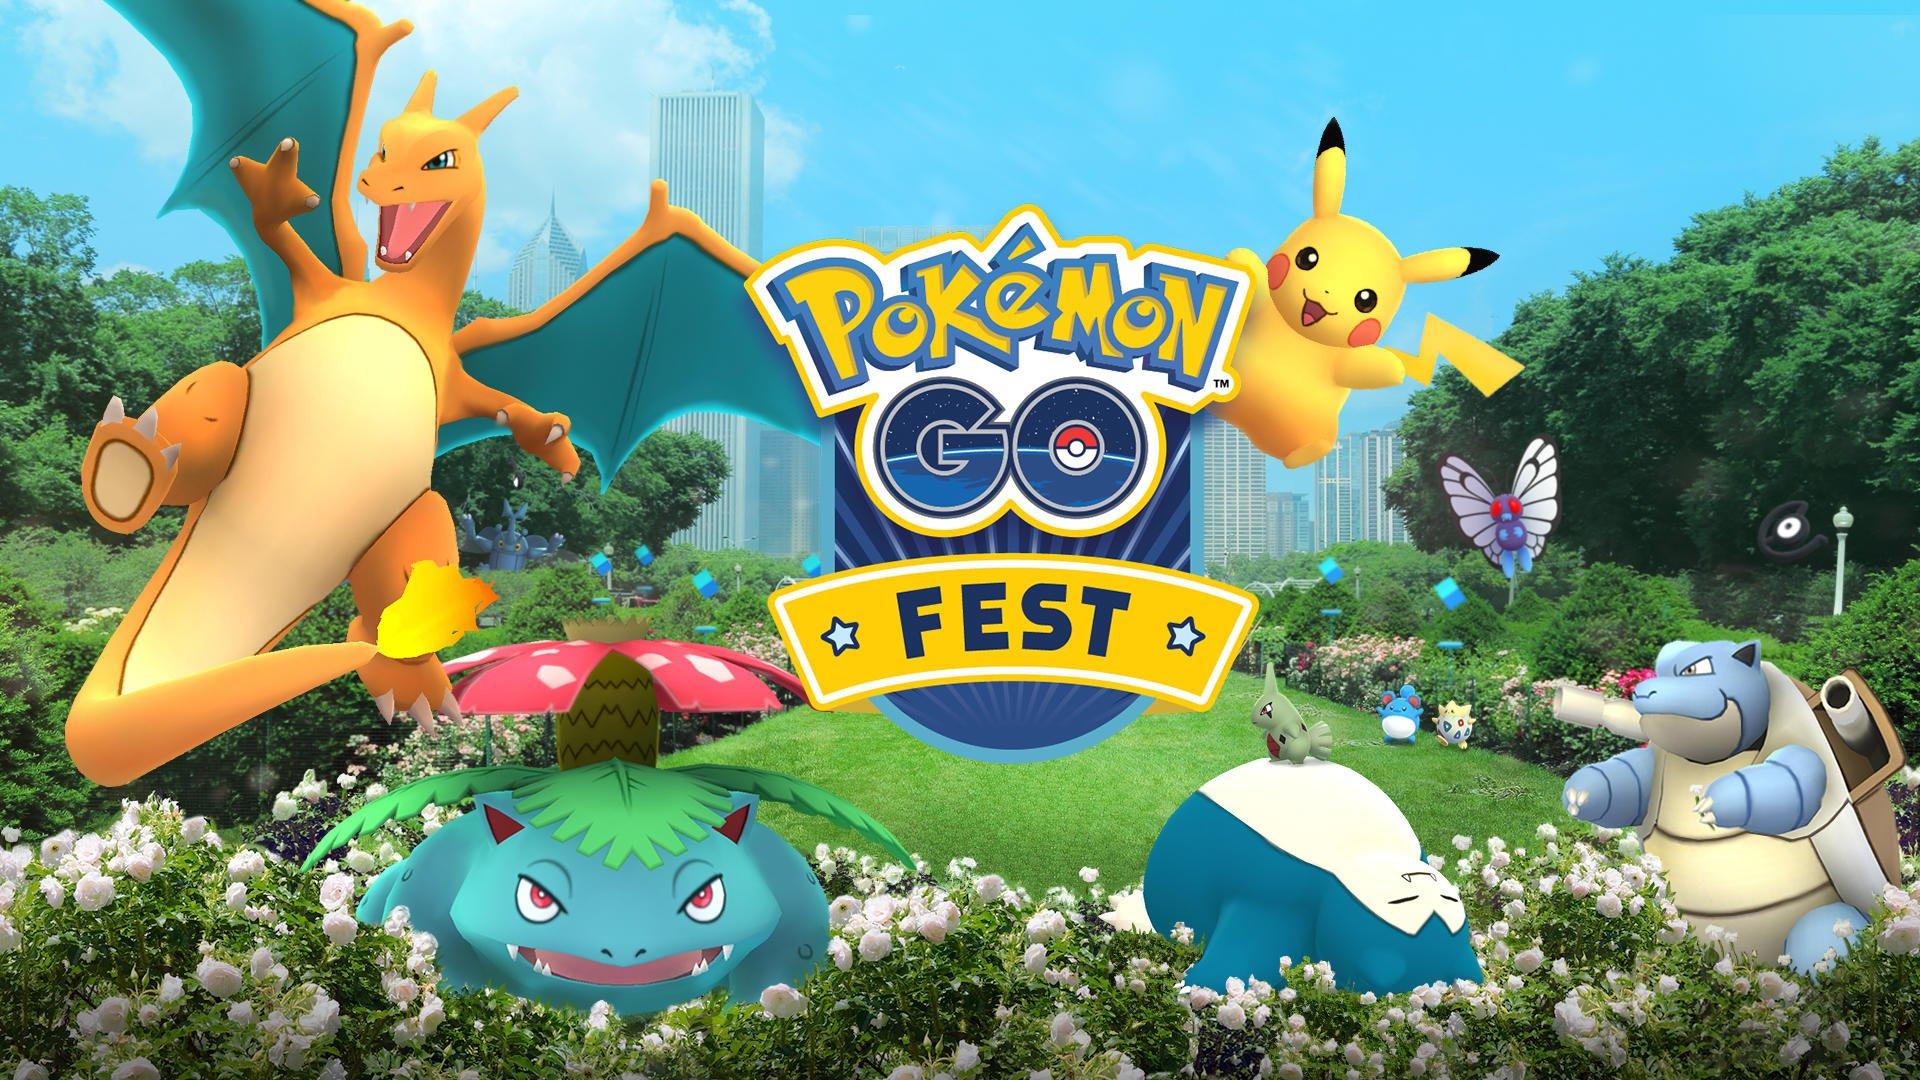 'Pokémon Go Fest' issues refunds after tech problems ruin event